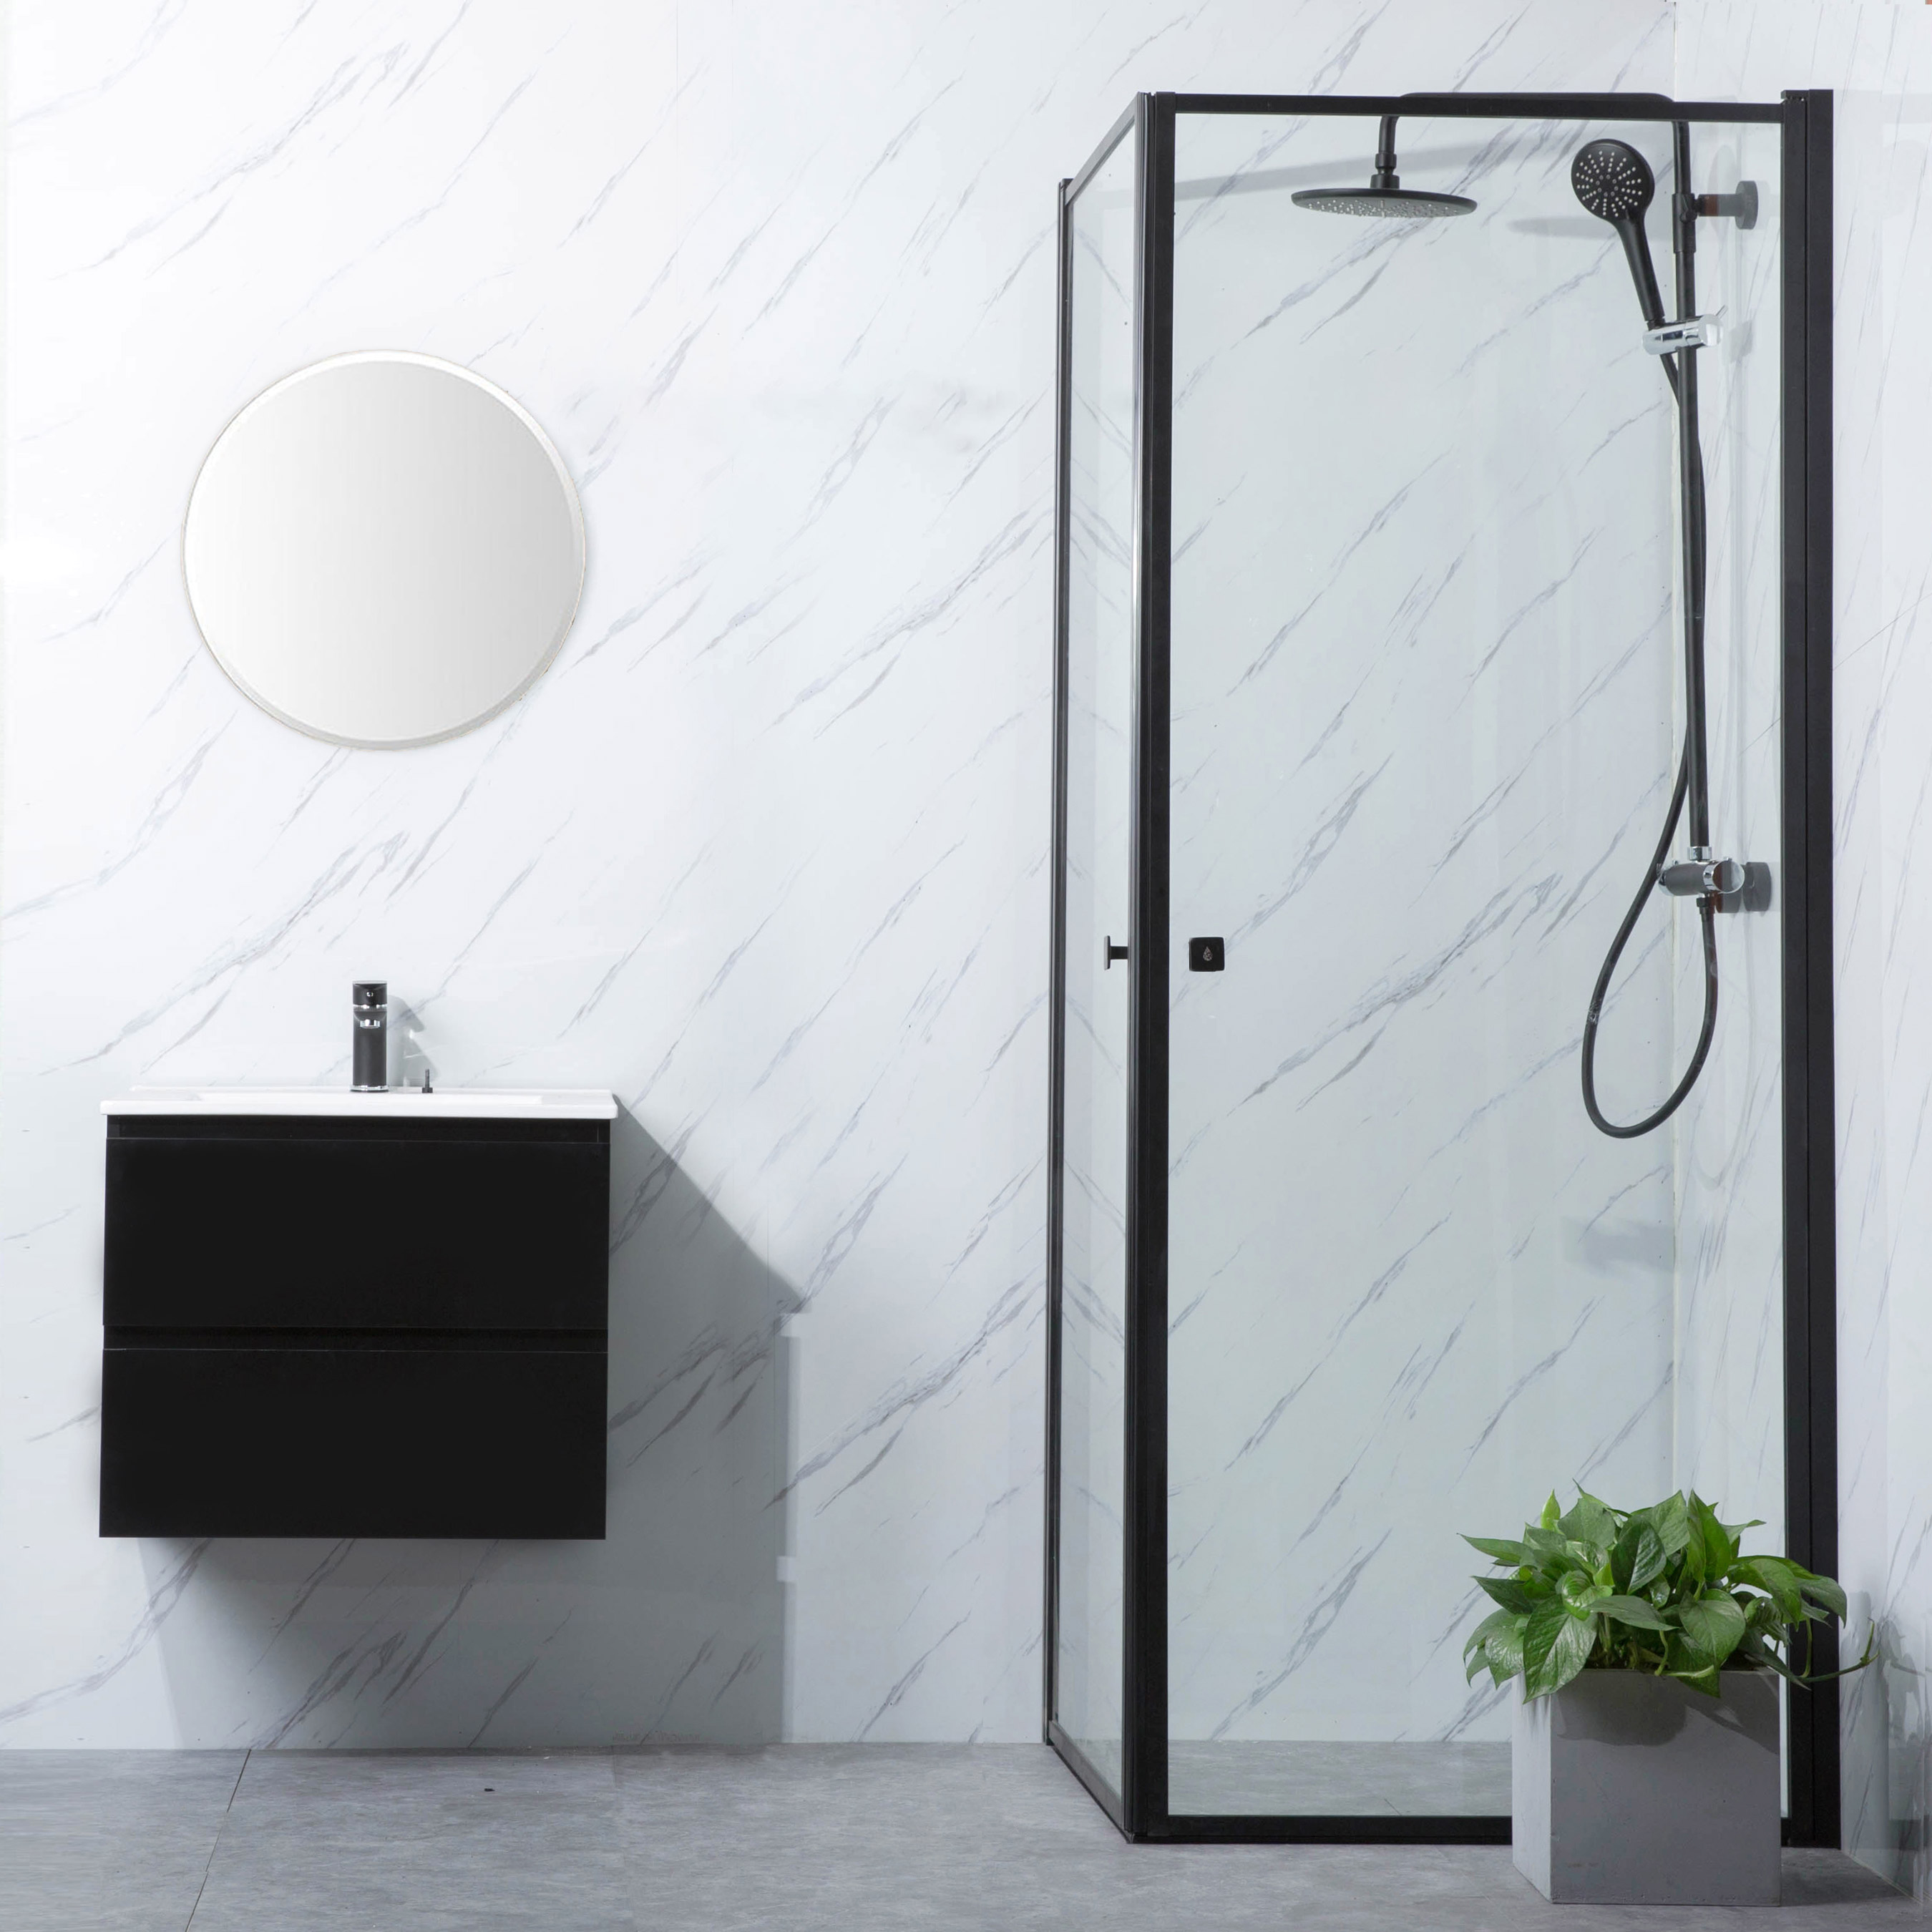 Duschhörn Bathlife Profil Rak Dörr + Rak Dörr